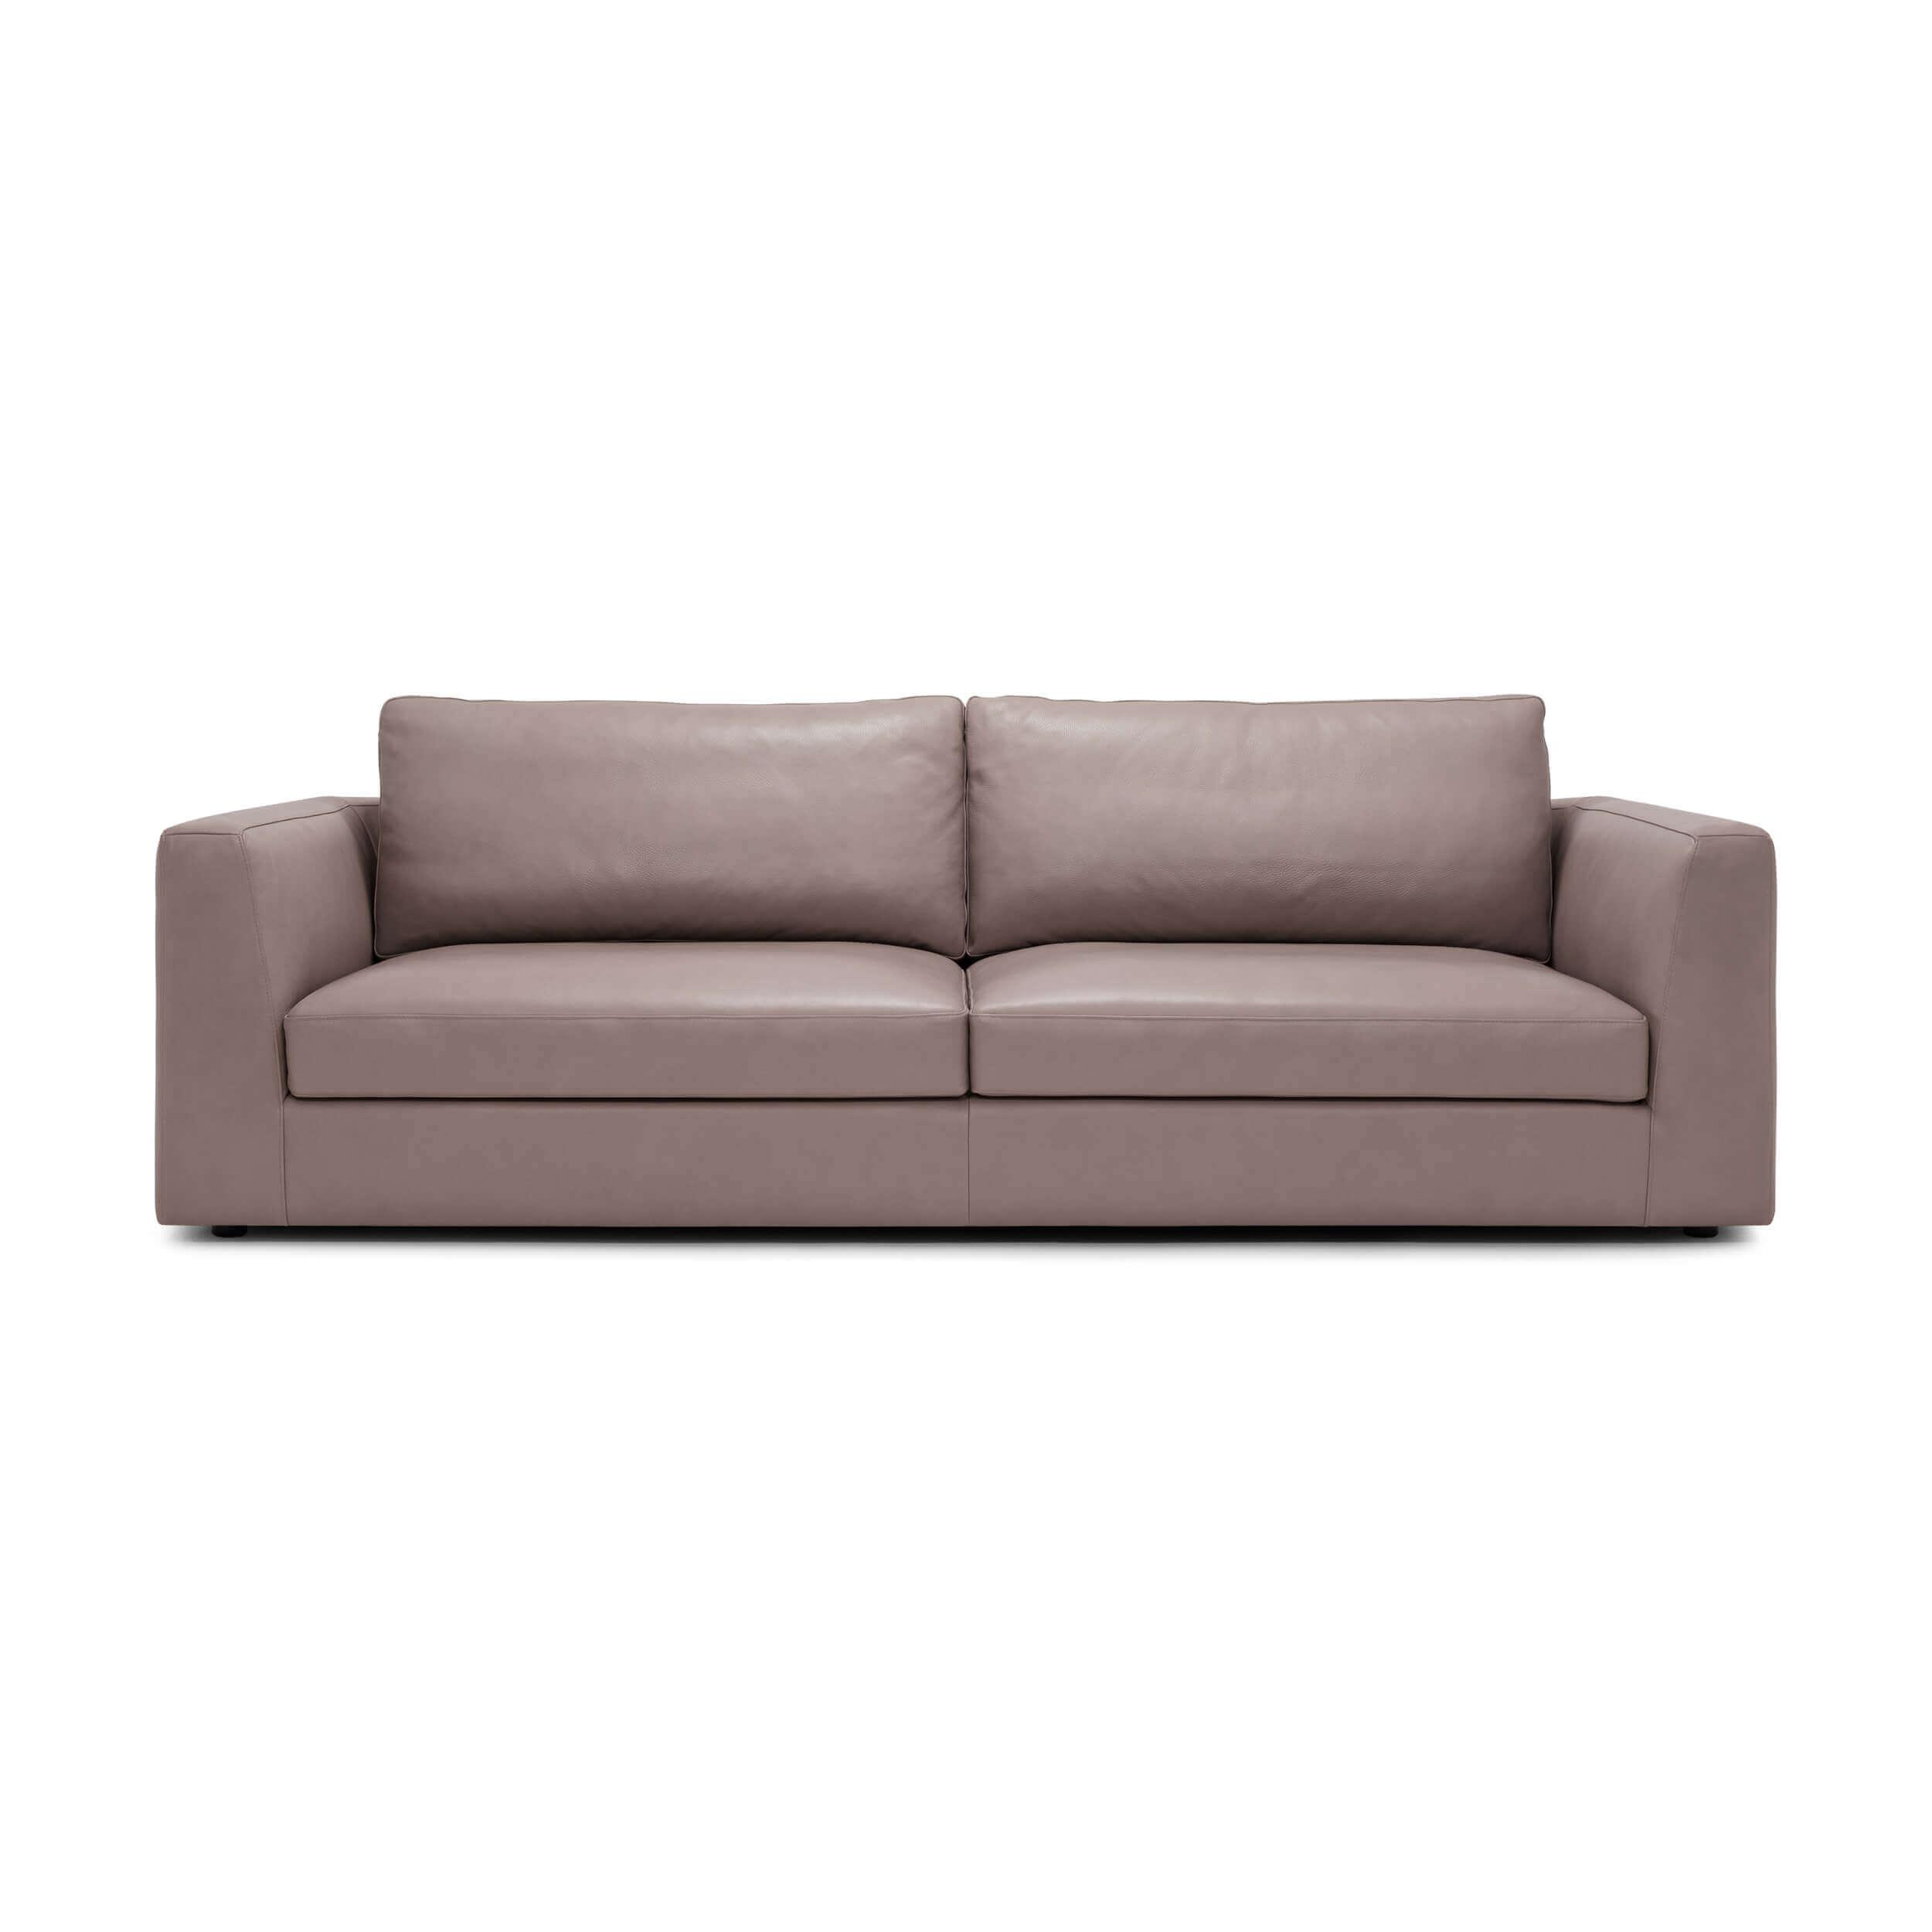 Cello 96 Sofa Leather